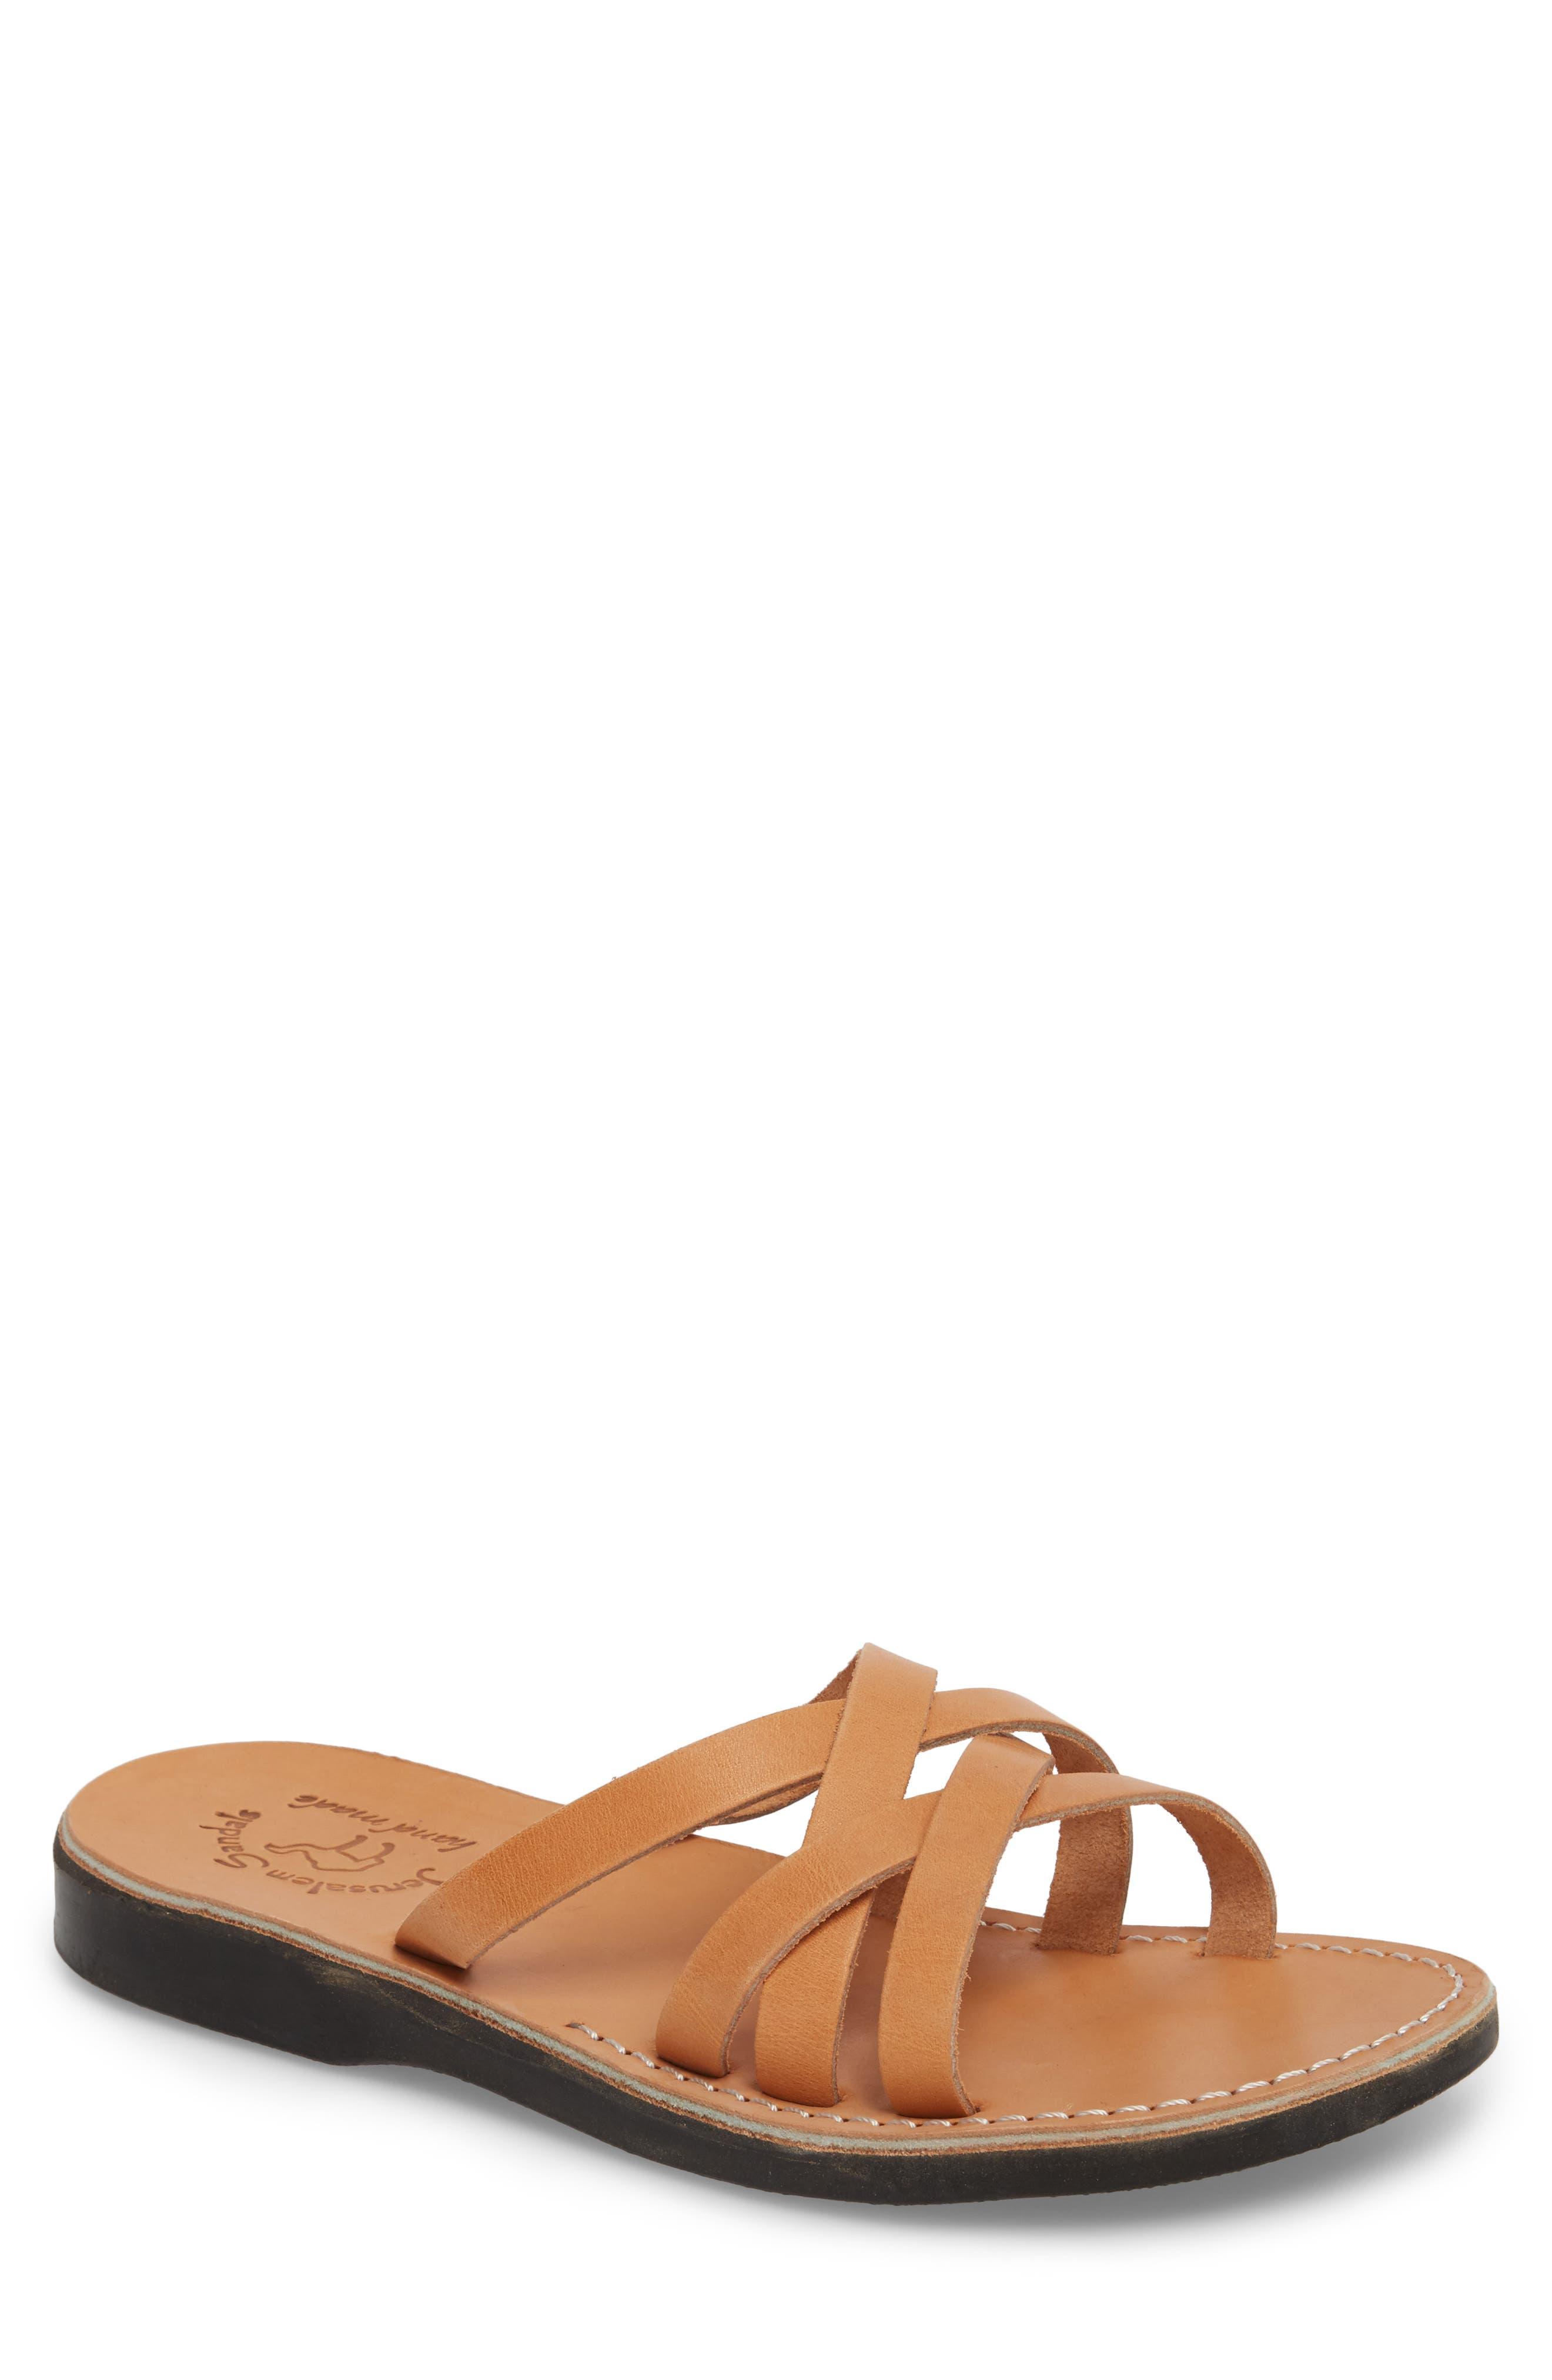 Gad Cross Strap Slide Sandal,                         Main,                         color, Tan Leather